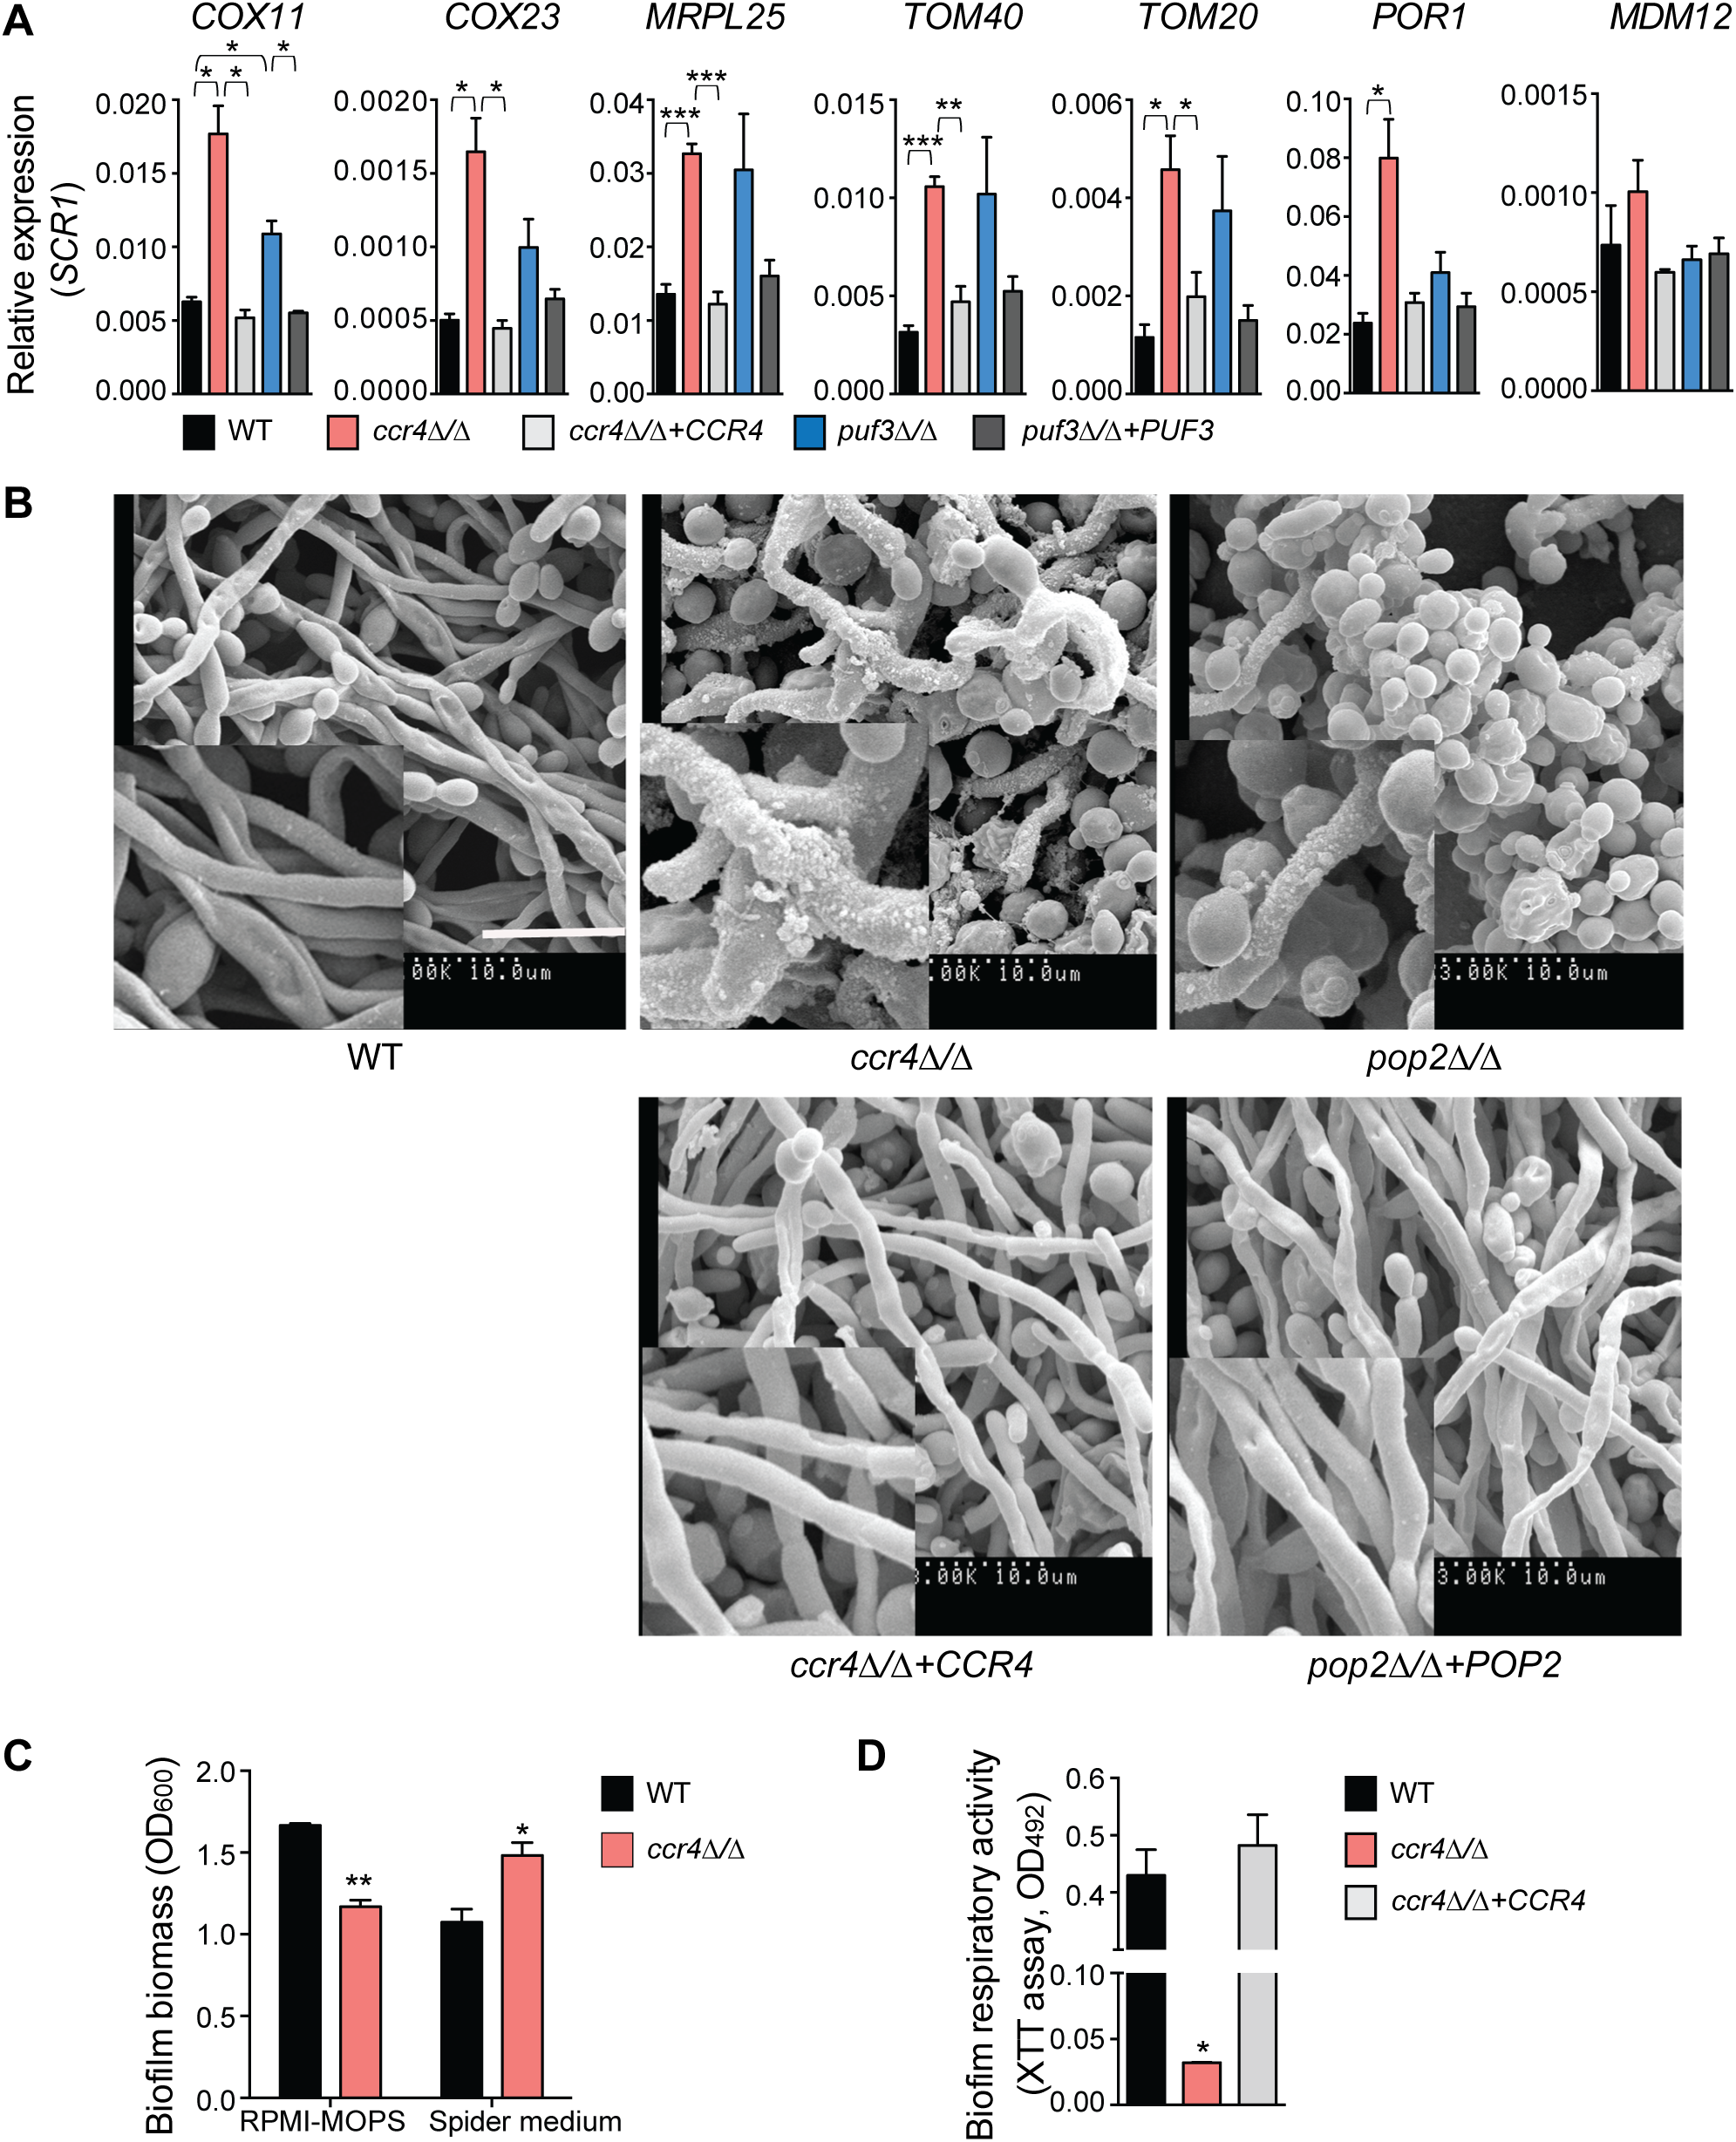 The mRNA deadenylase Ccr4 regulates extracellular matrix production in biofilms.